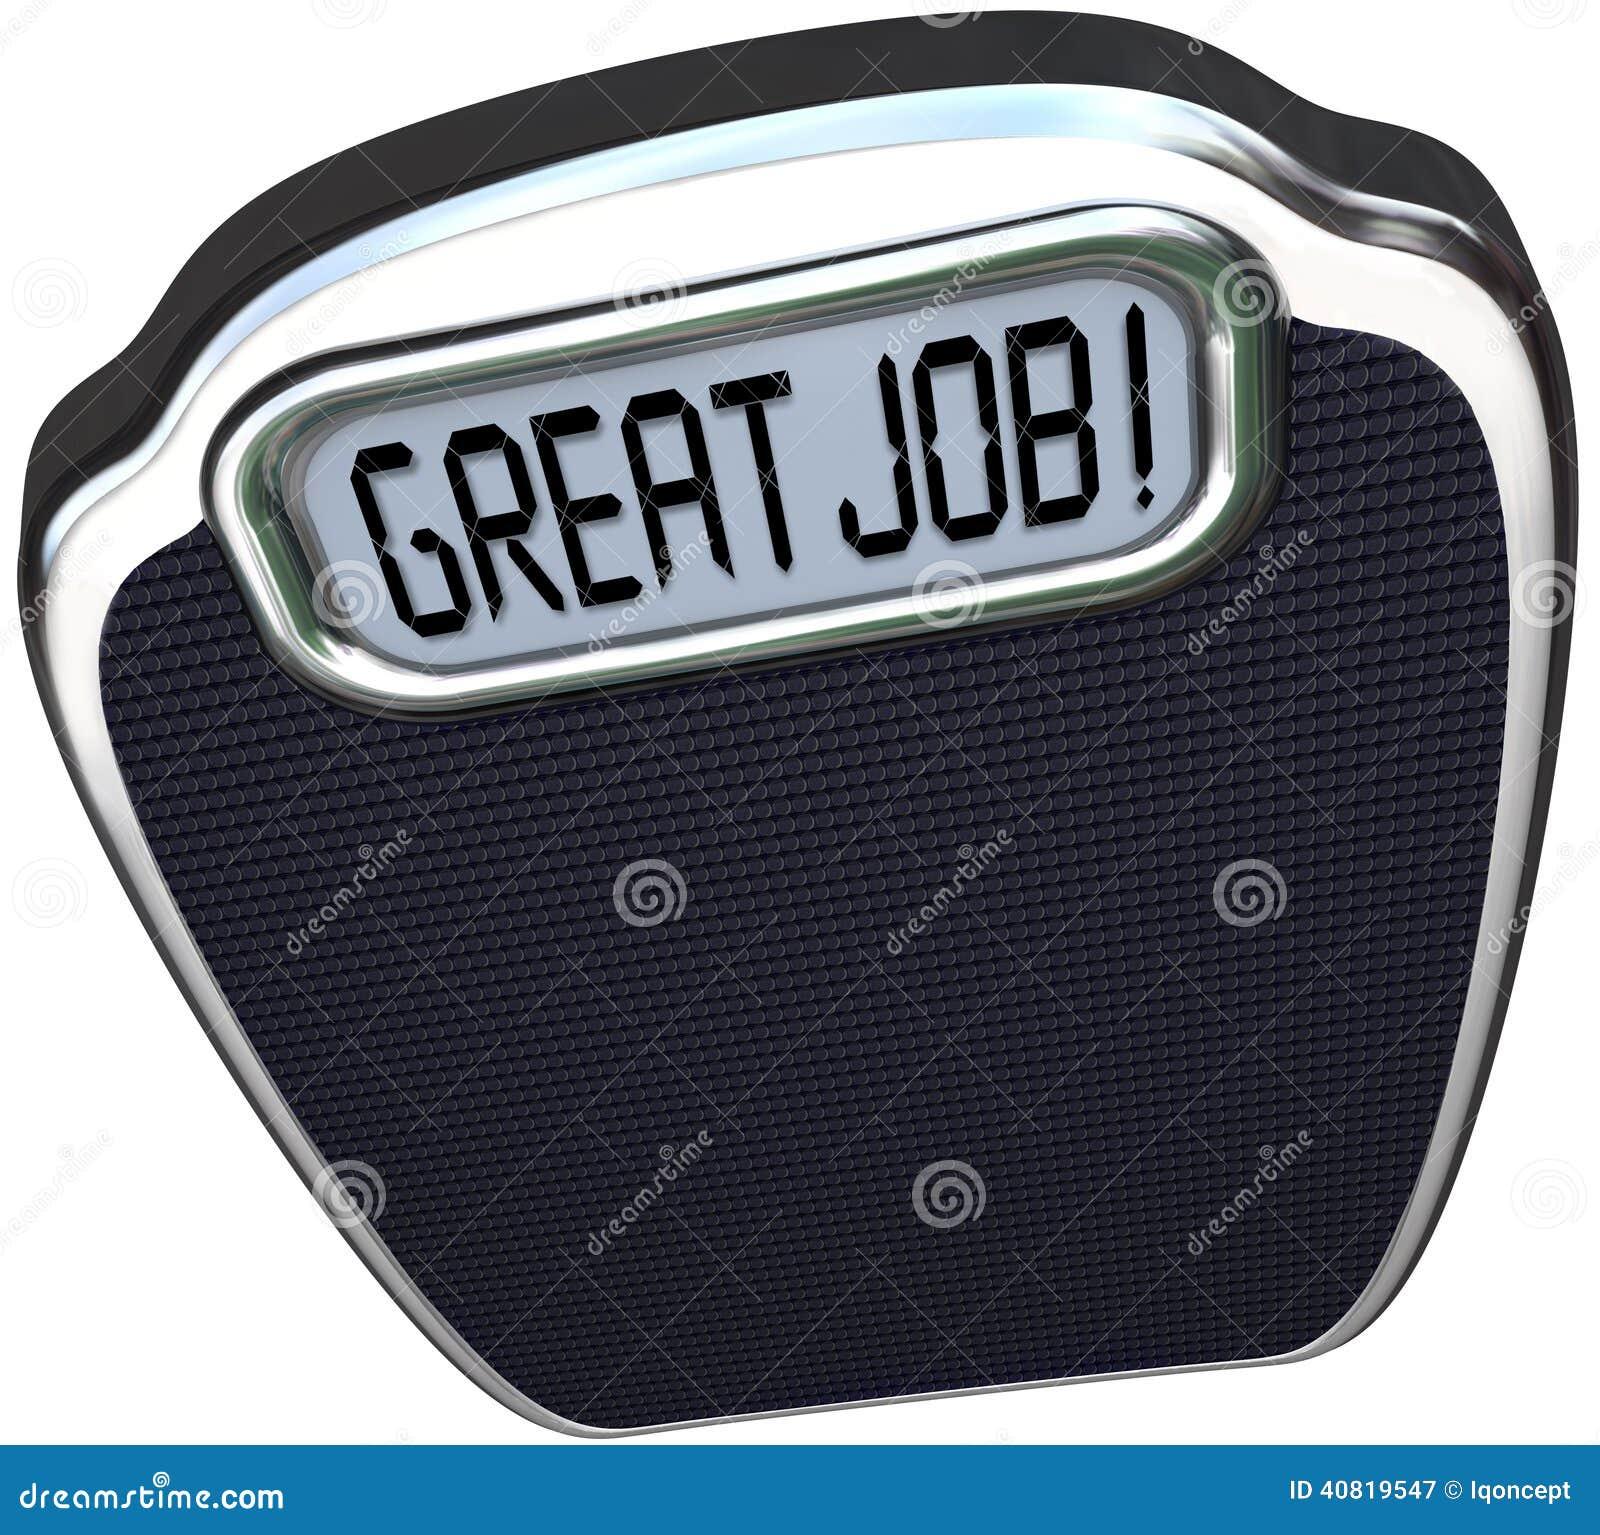 best job for business major